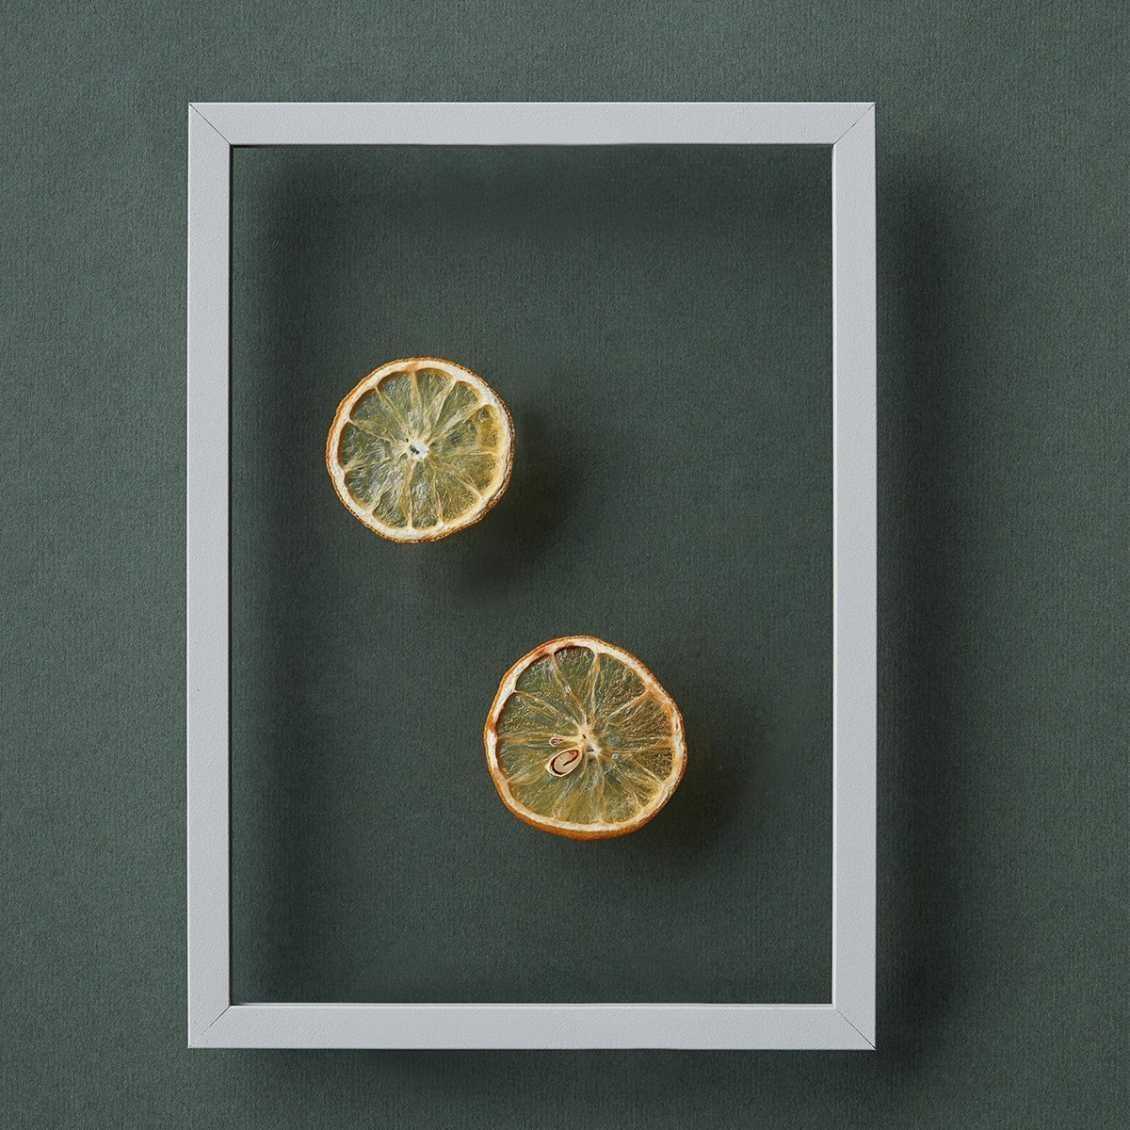 Moebe frame A4 light grey